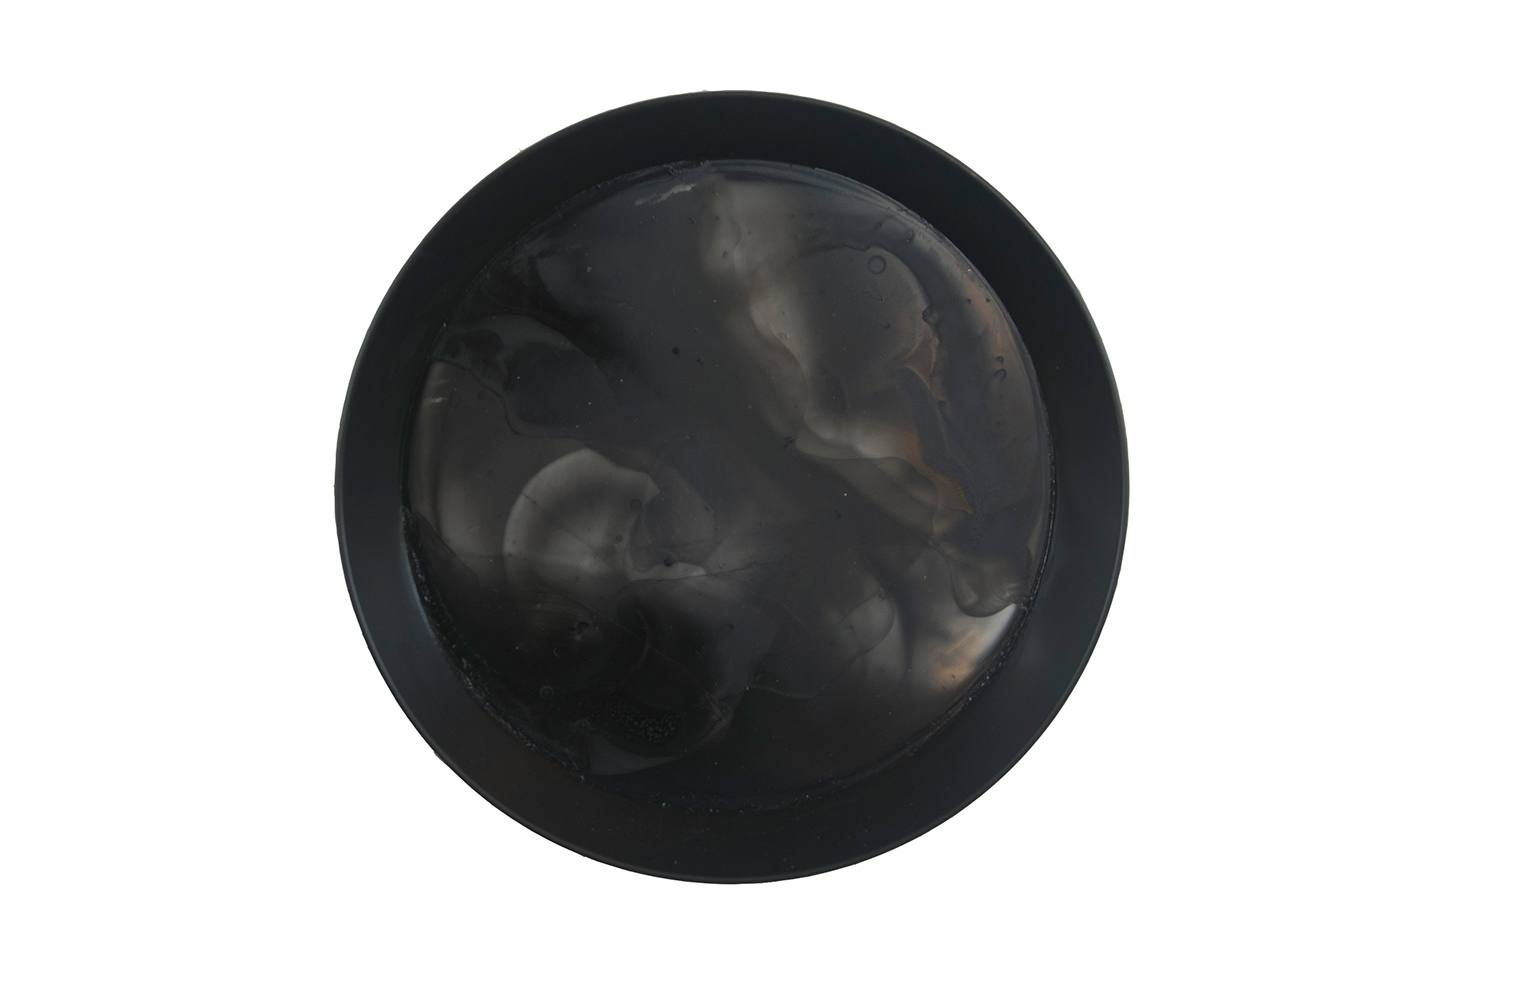 Flattened Sphere #3